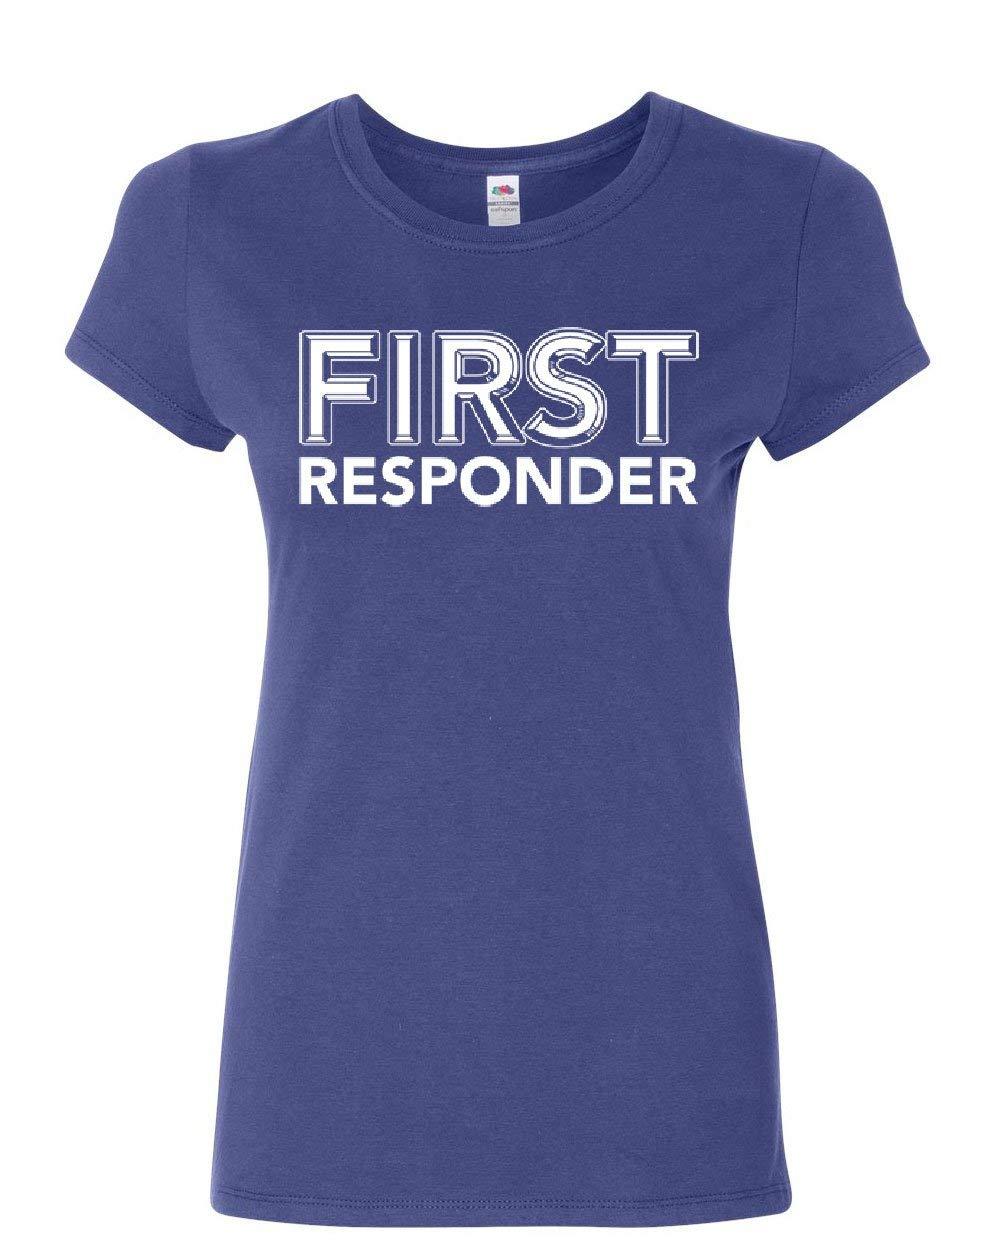 First Responder Tshirt Emergency Service Emt Police Firefighter Shirt